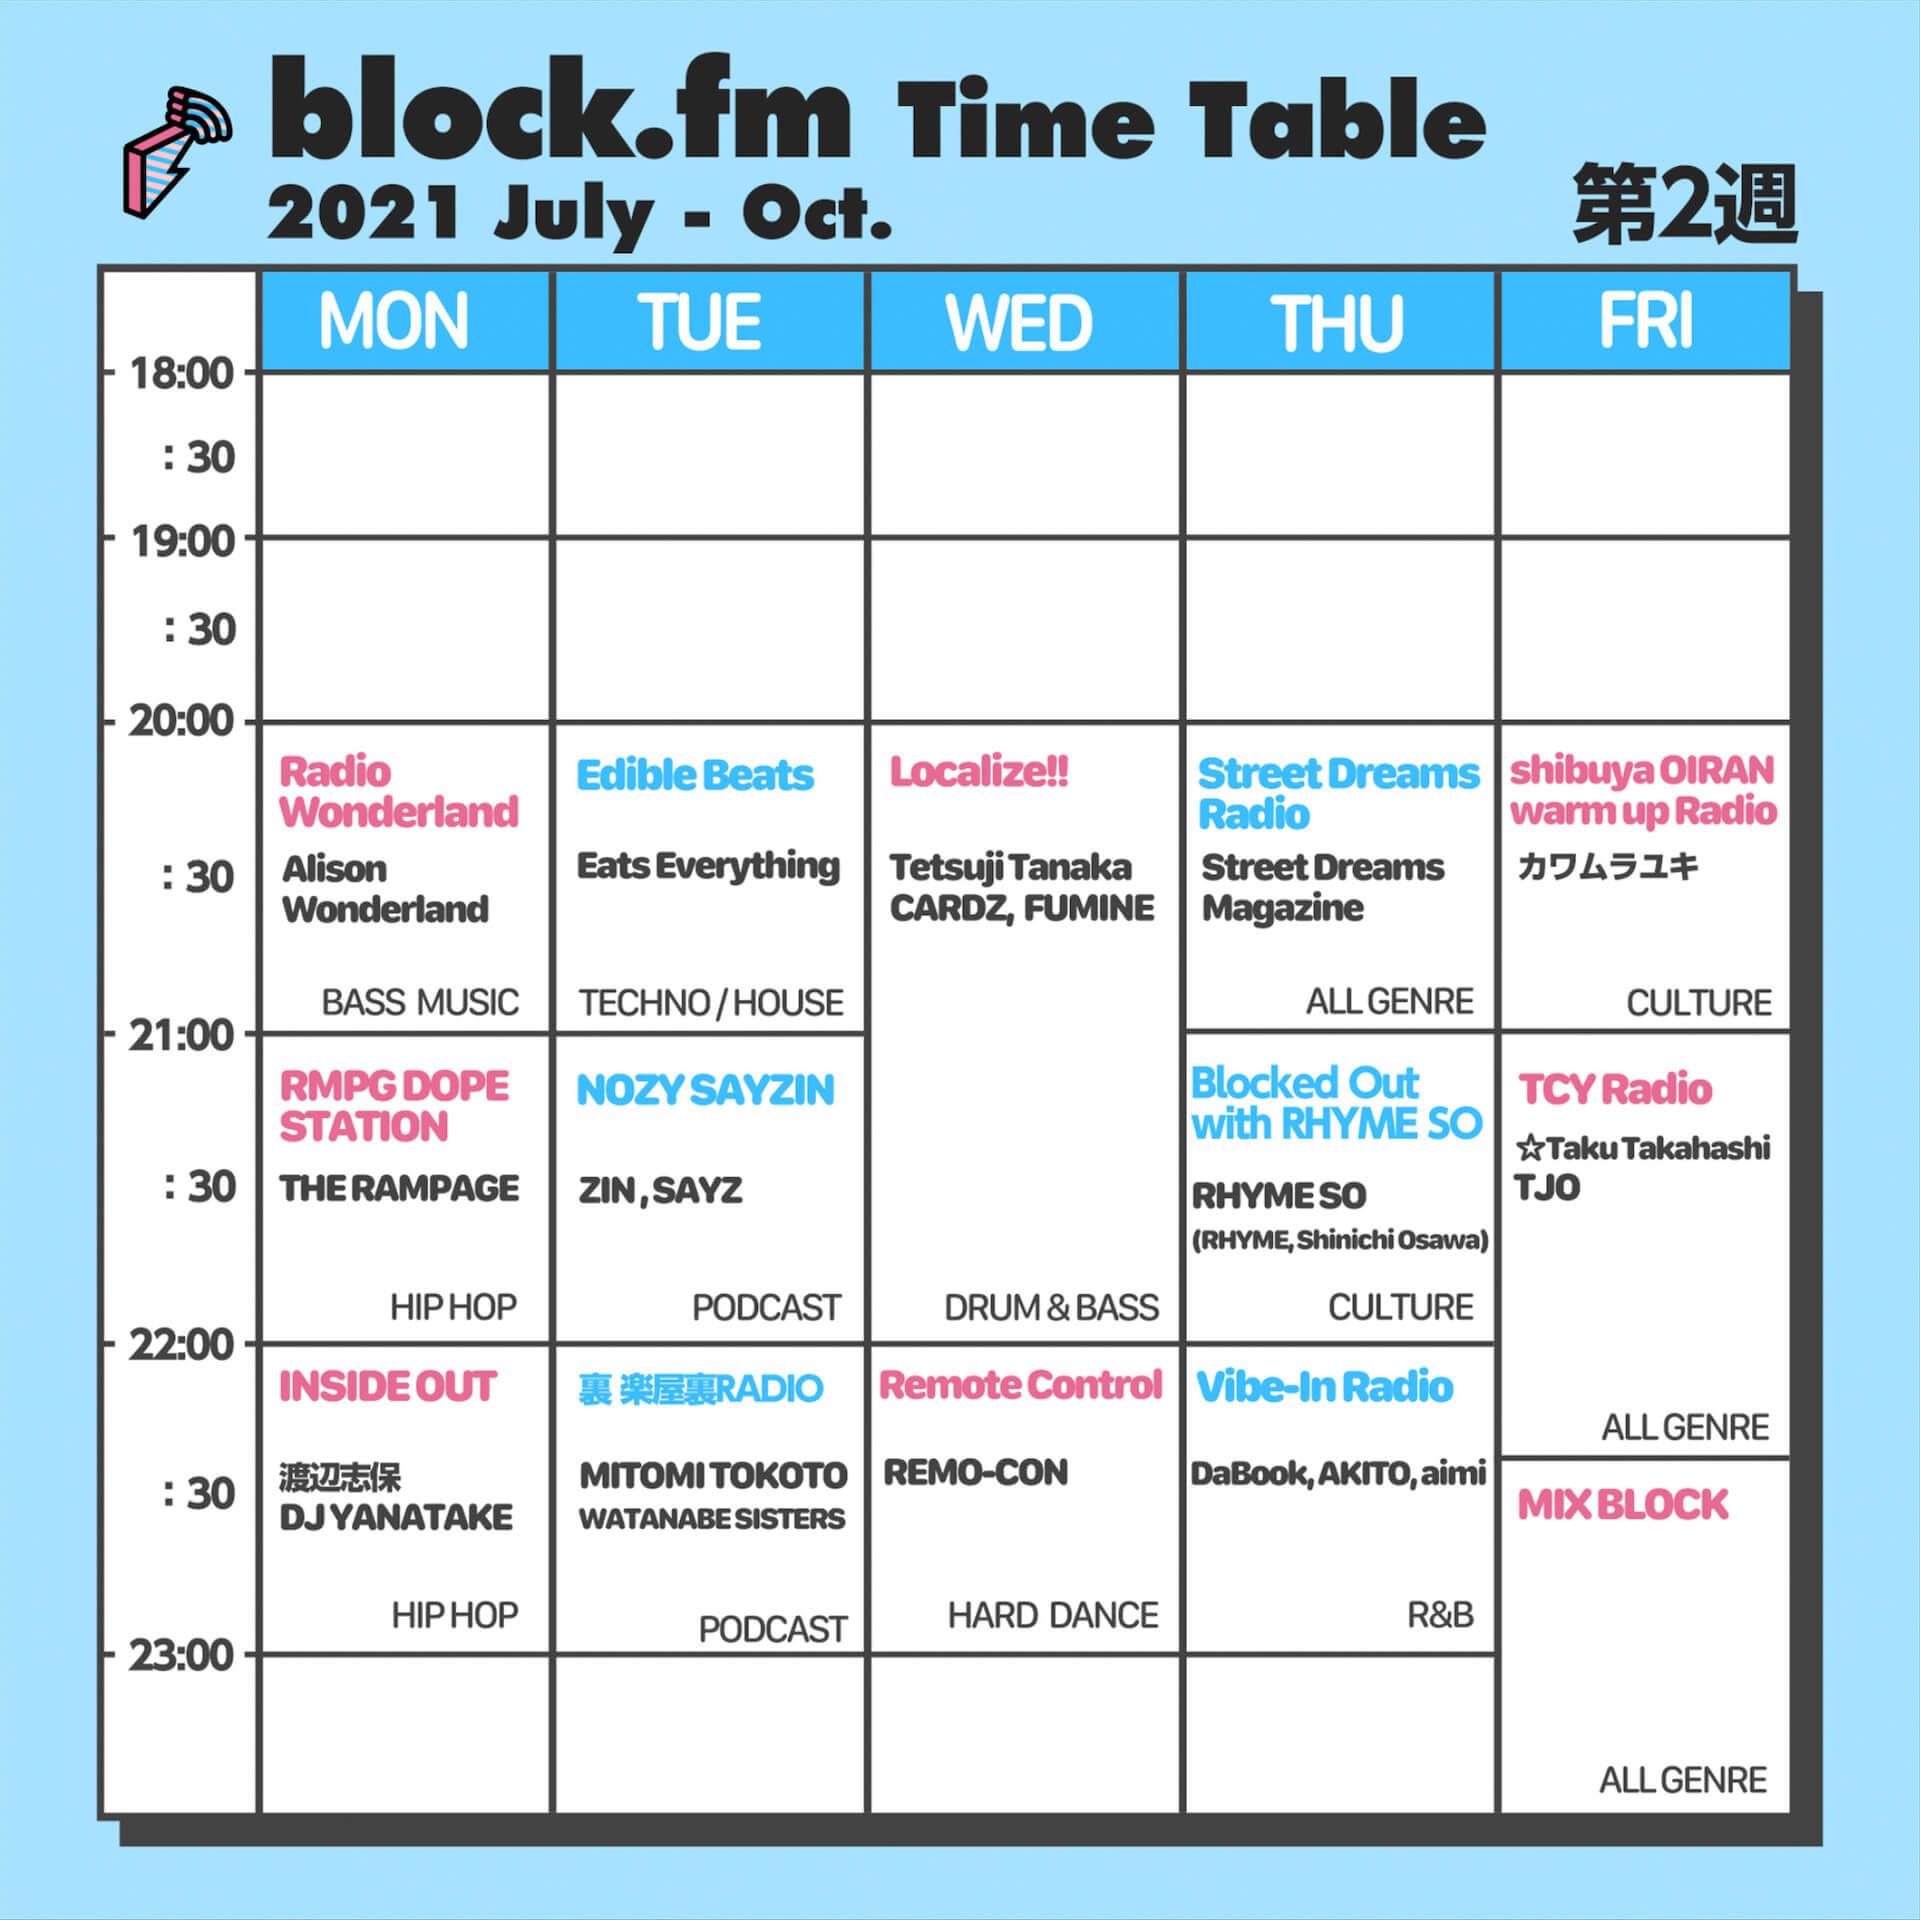 block.fmにて三原勇希のレギュラー番組『Time for Bed』が゙放送スタート!7月以降のラジオ放送スケジュールも公開 music_210702_Time-for-Bed6